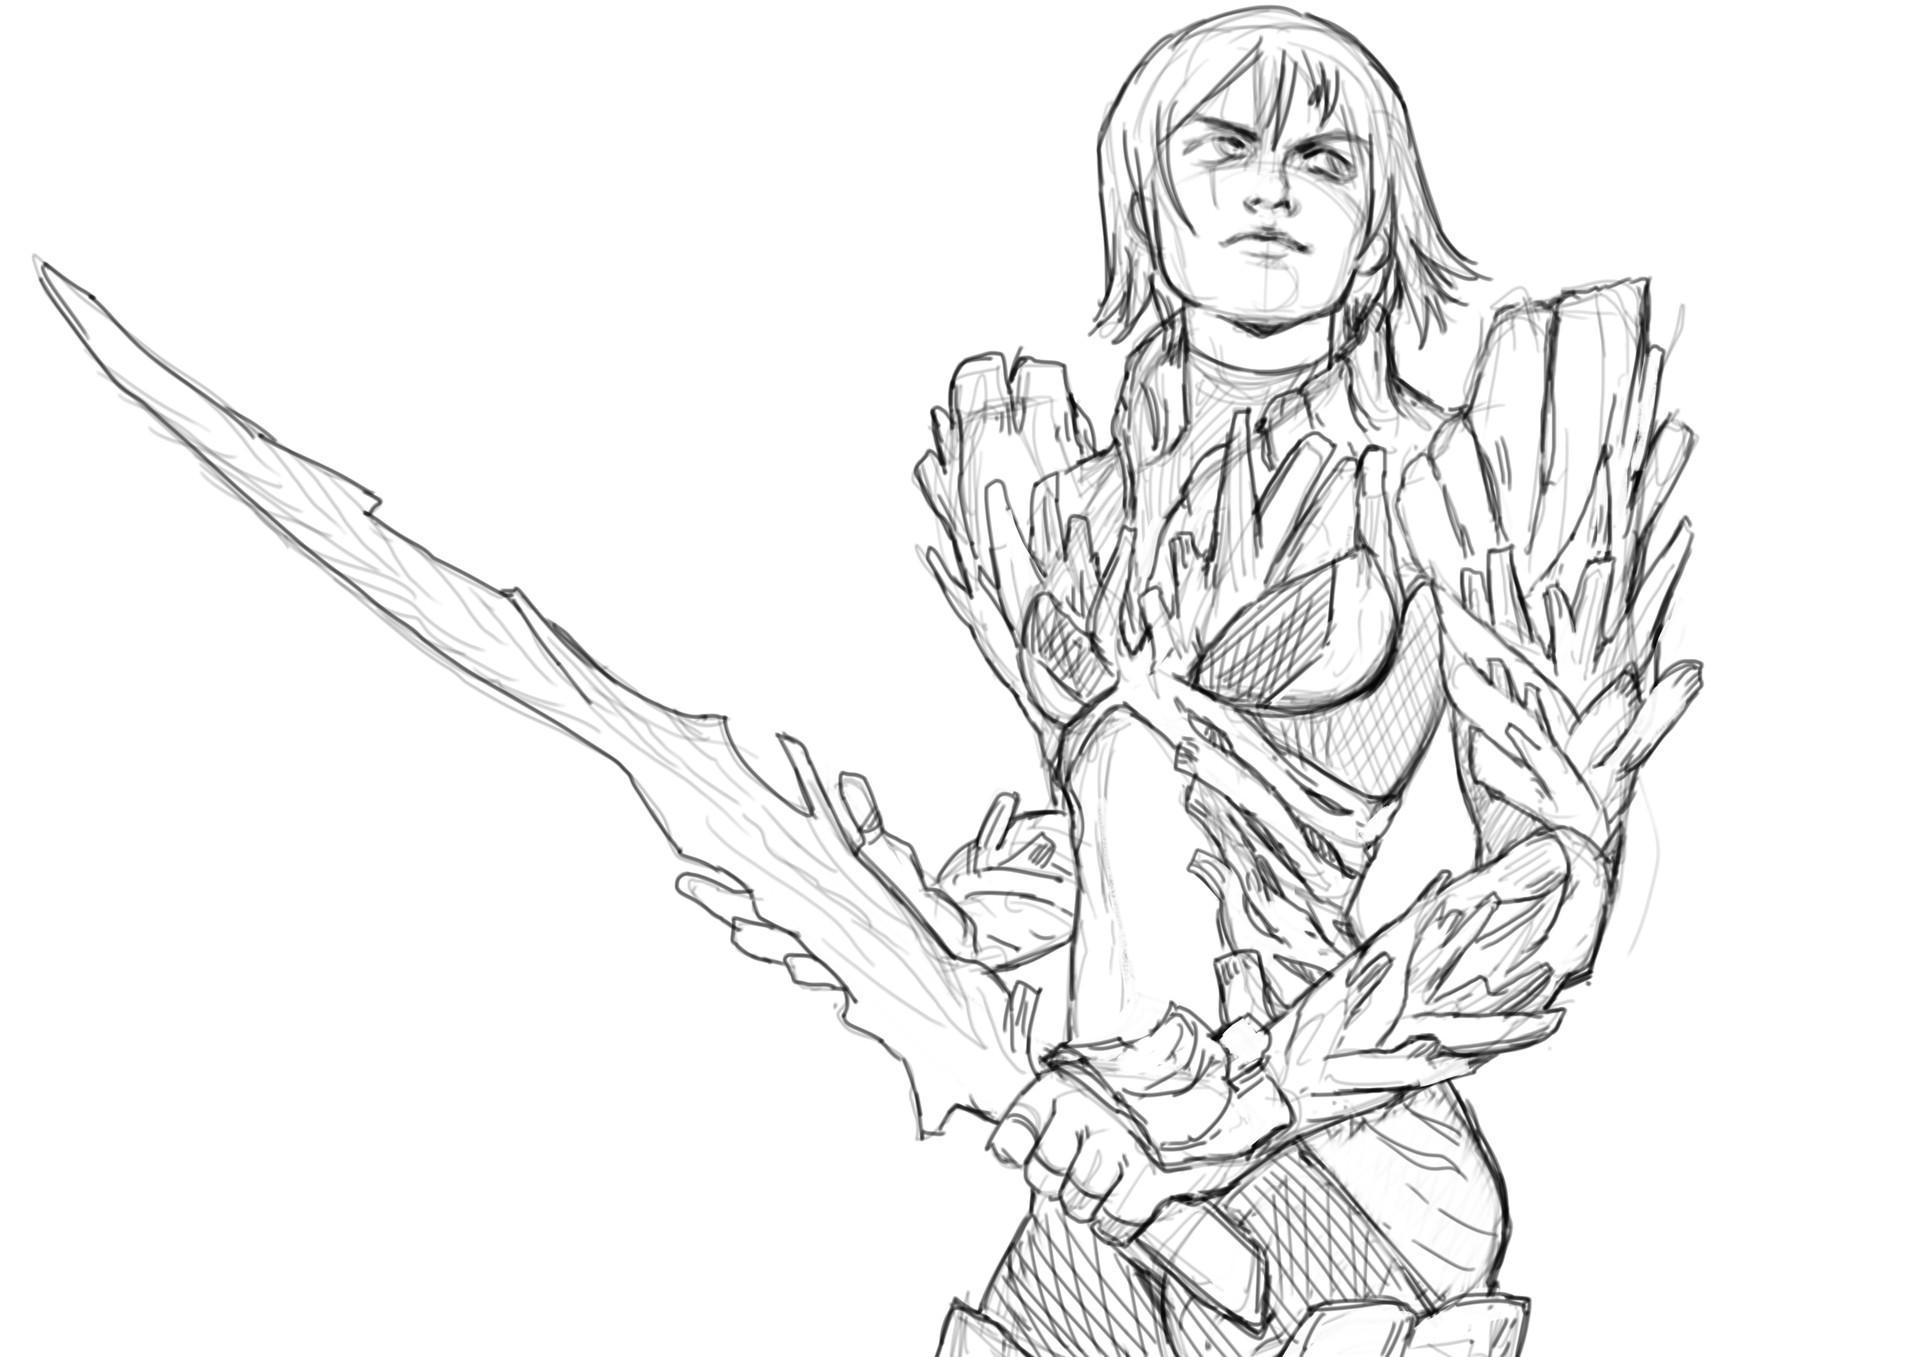 Stef tastan sketch1